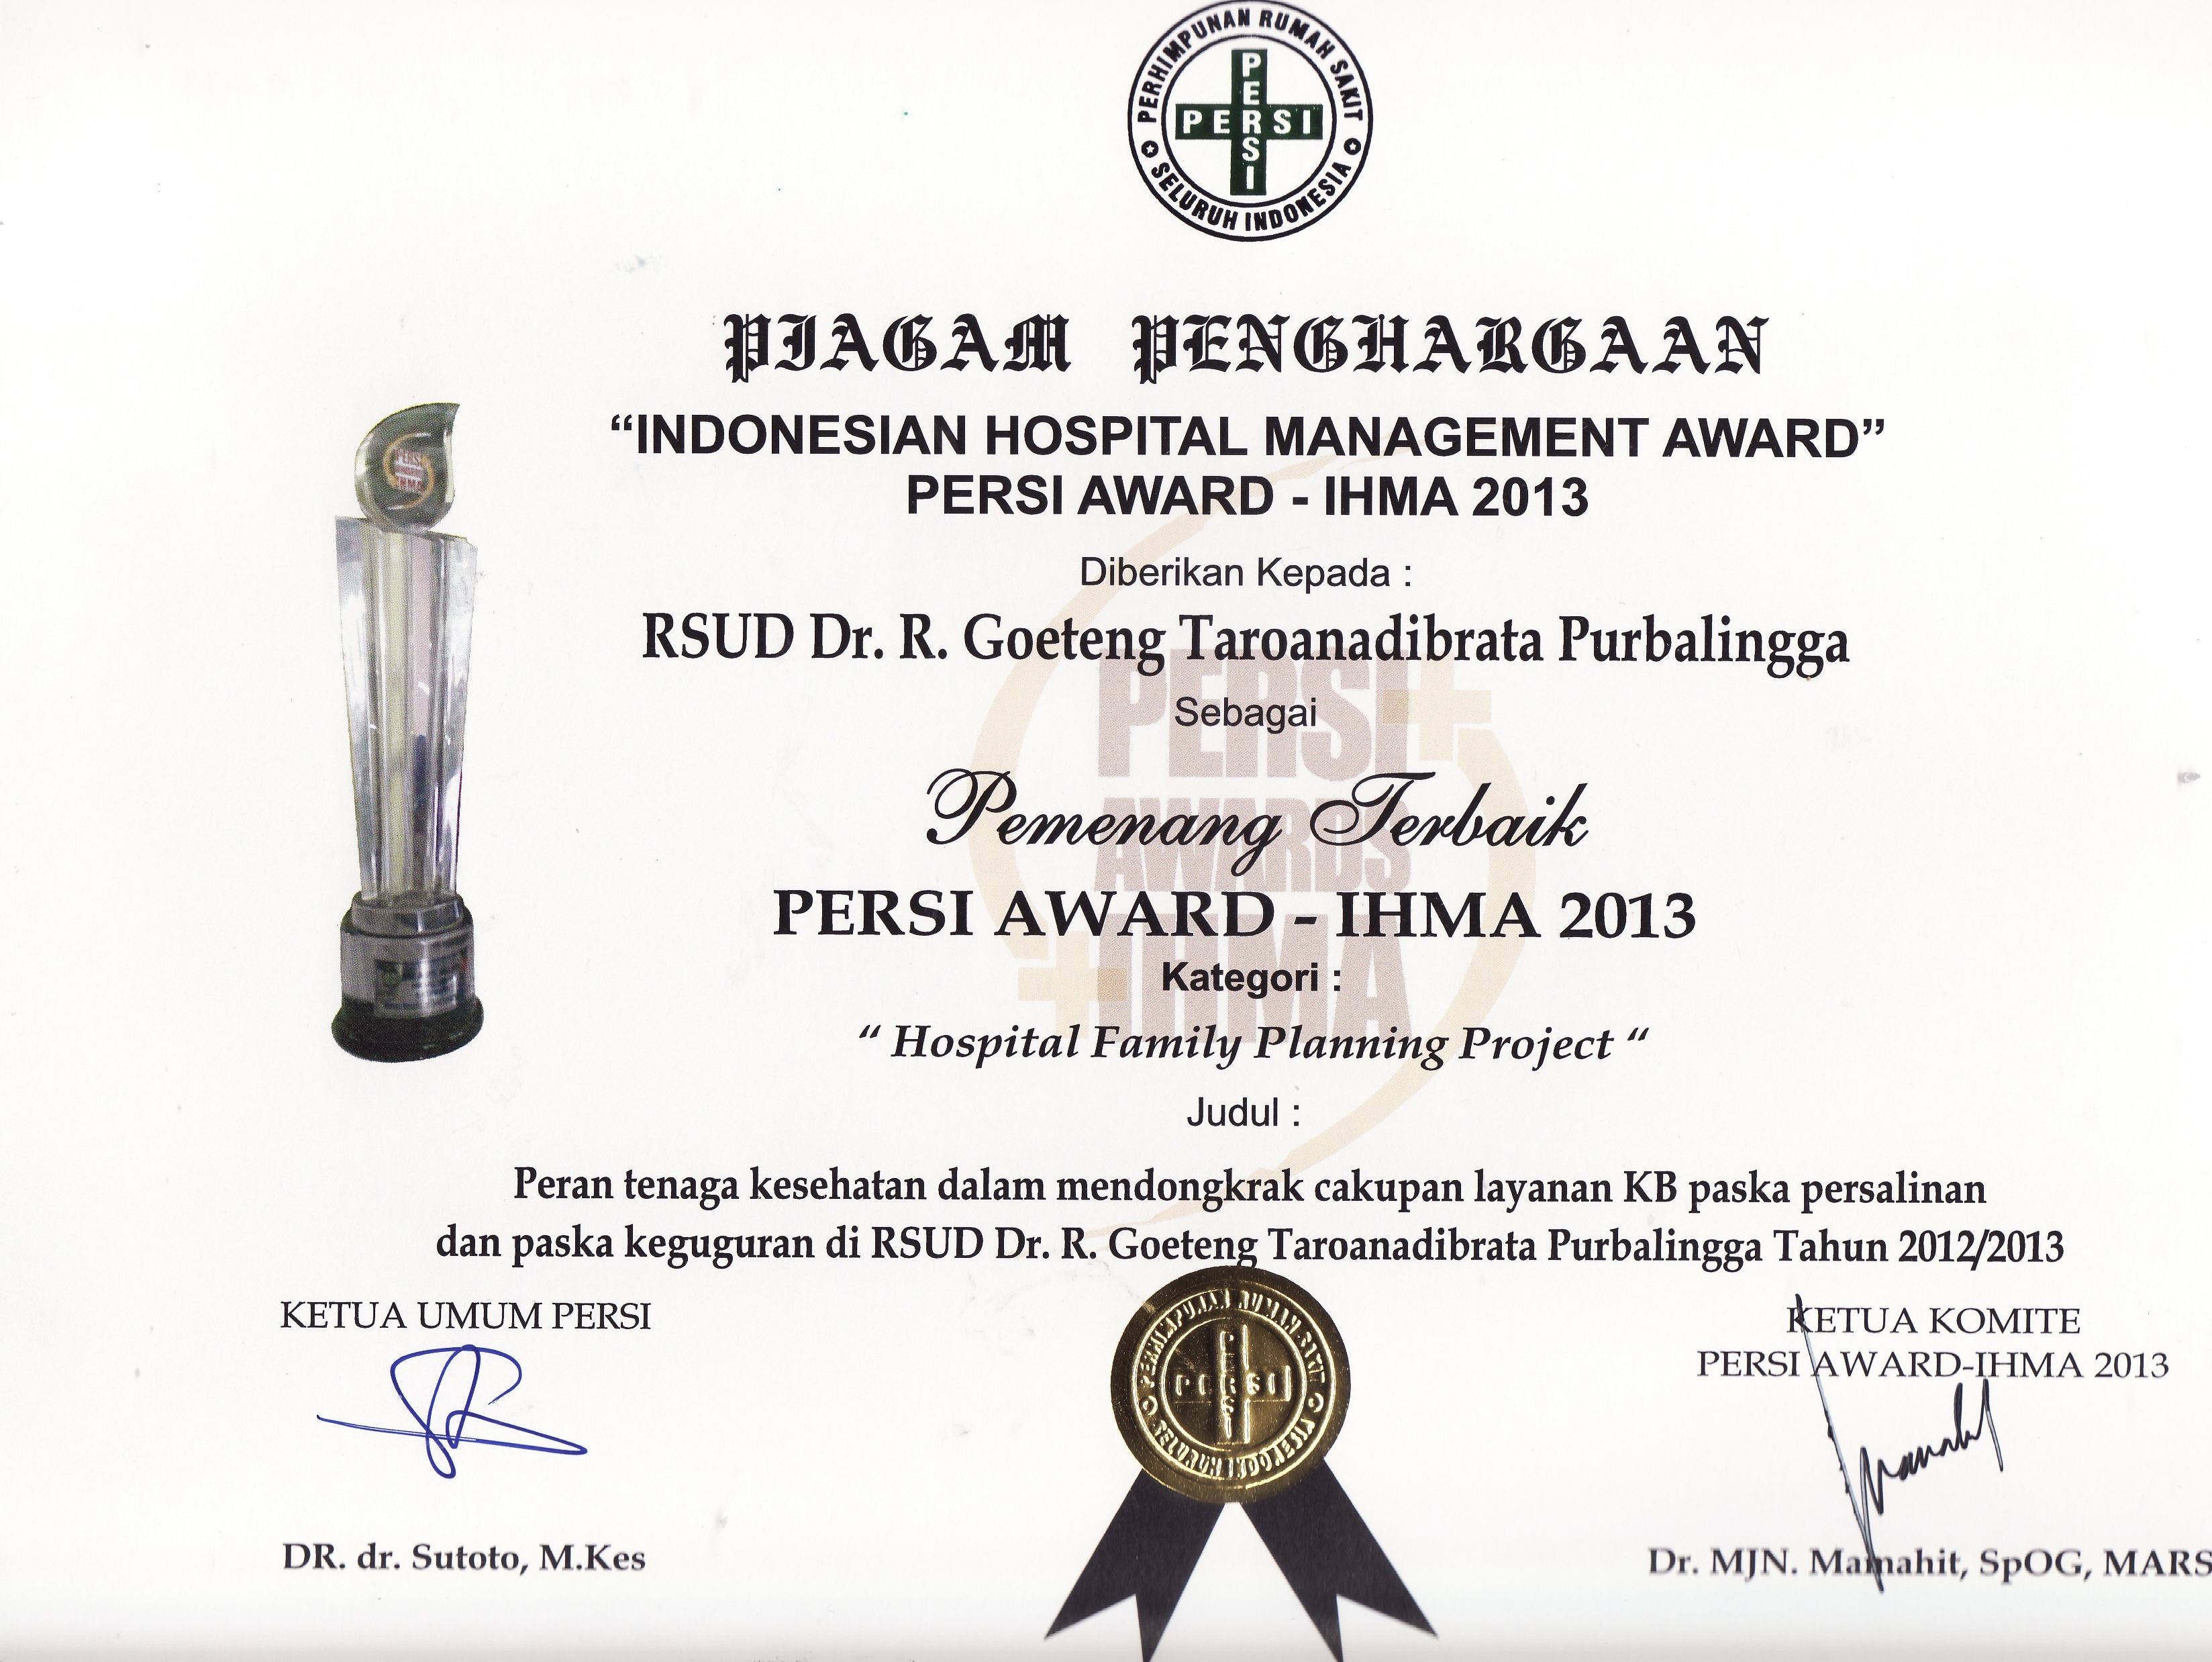 RSUD dr. R. Goeteng Taroenadibrata Juara Nasional Persi Award 2013